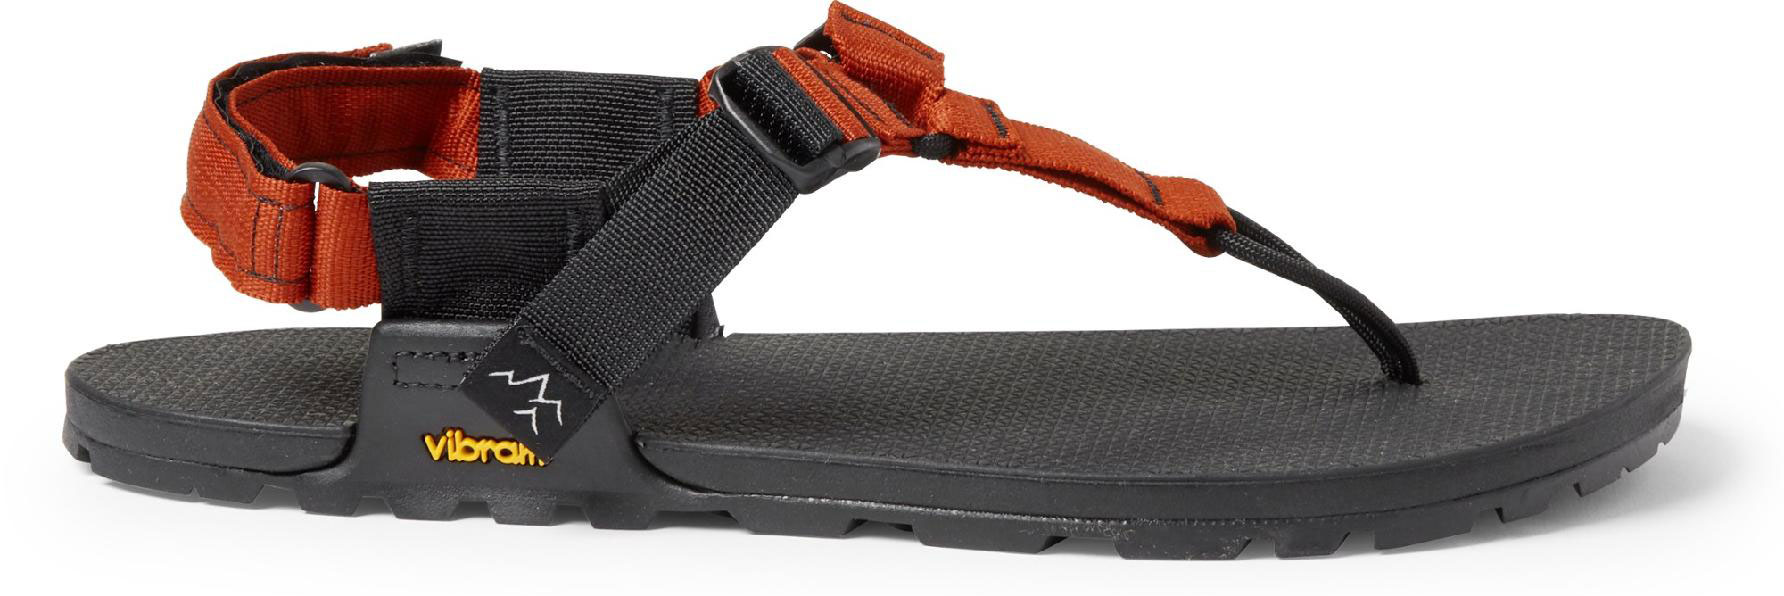 Bedrock Sandal